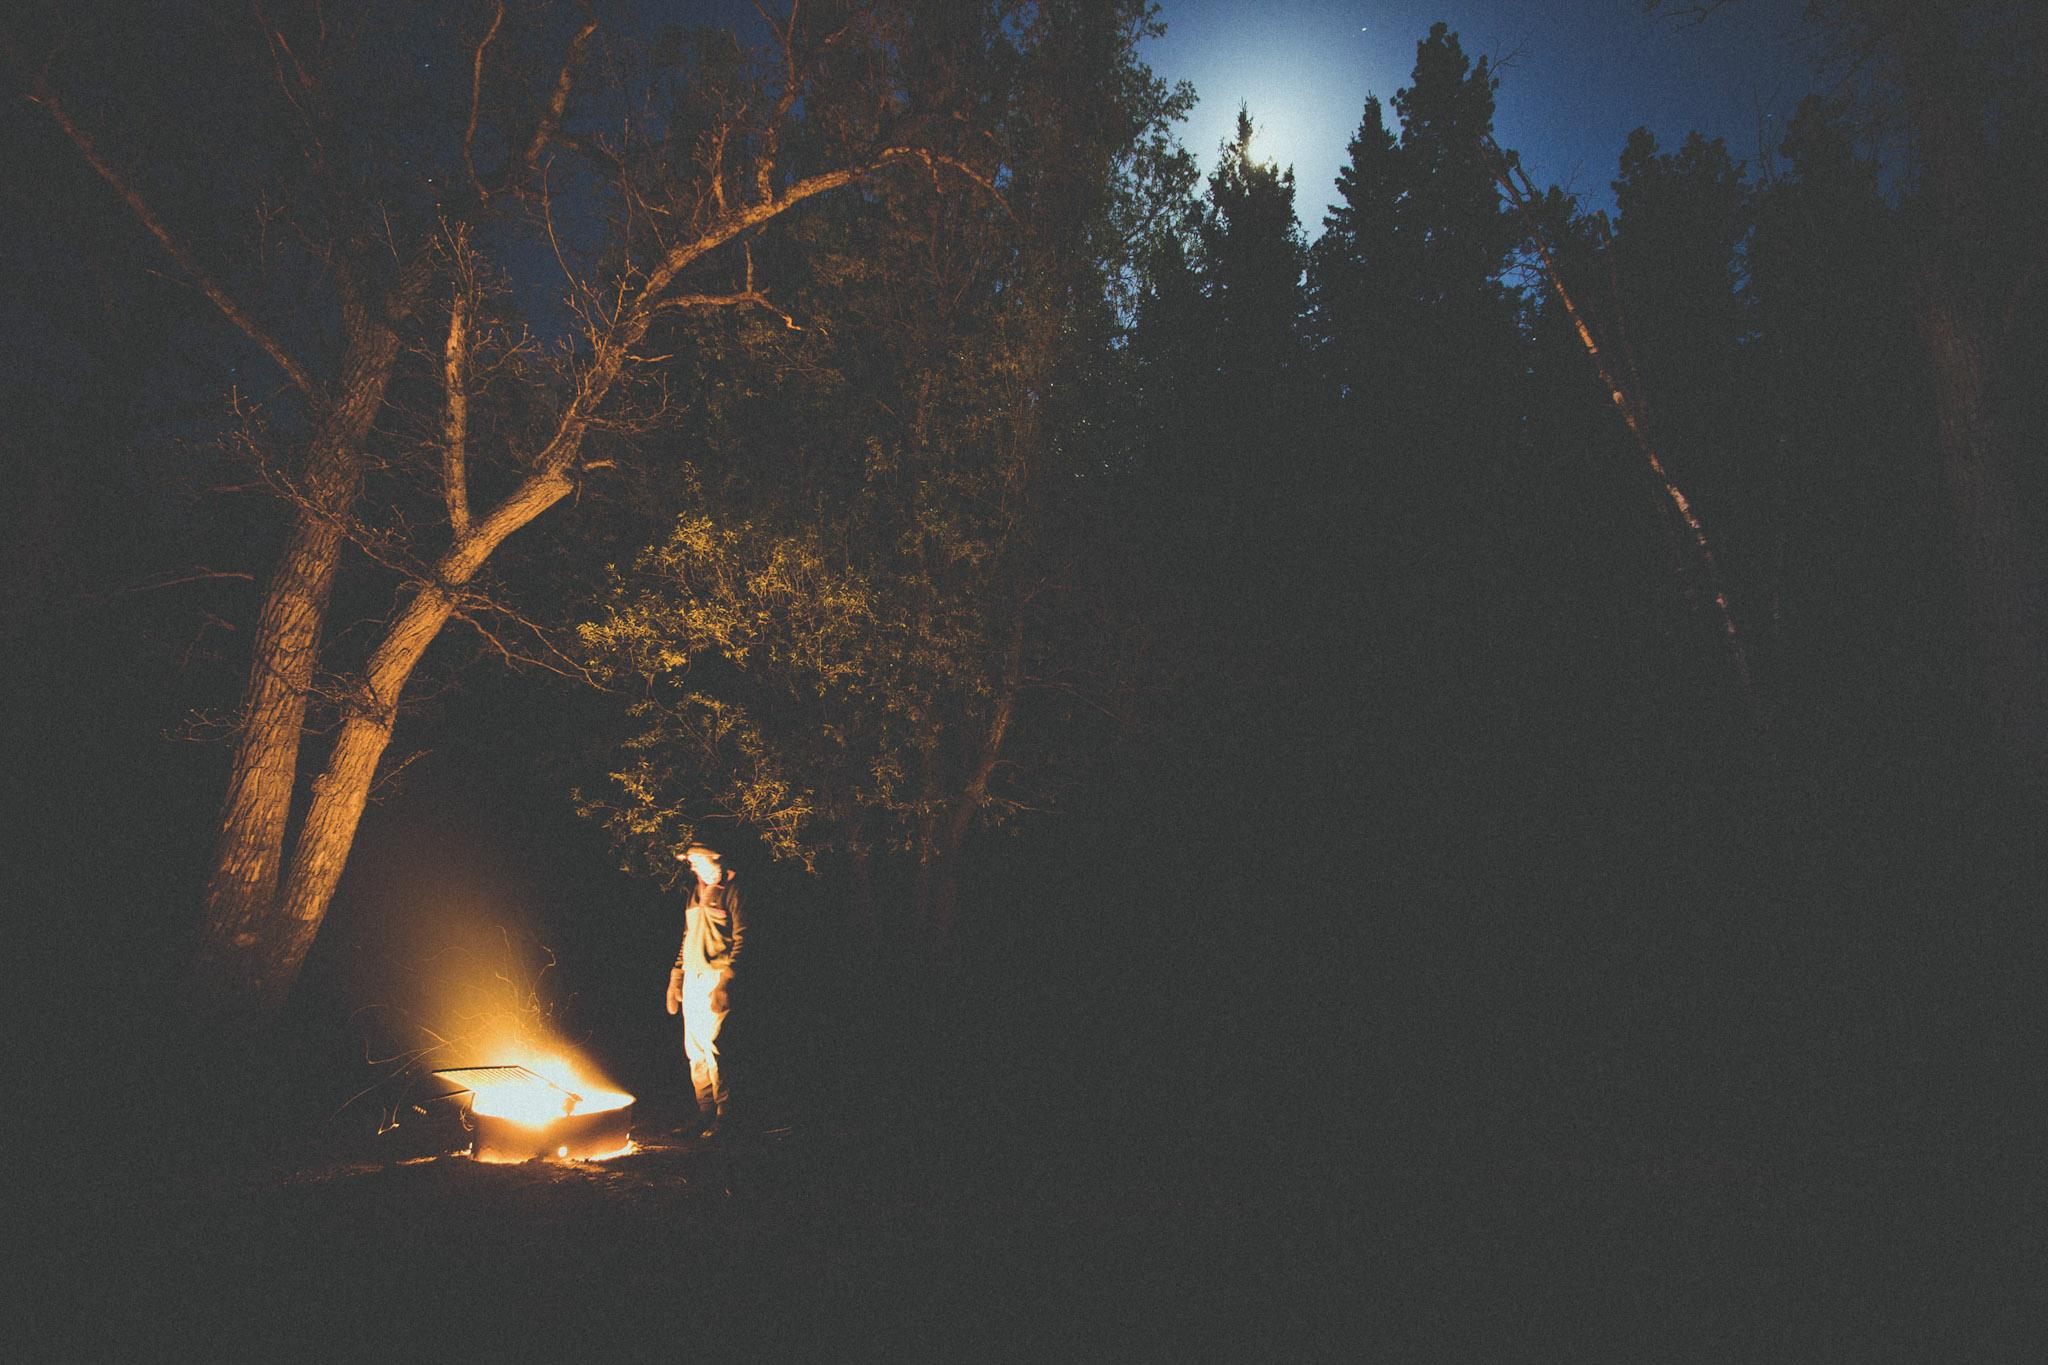 meditation, concentration kathleen slattery-moschkau